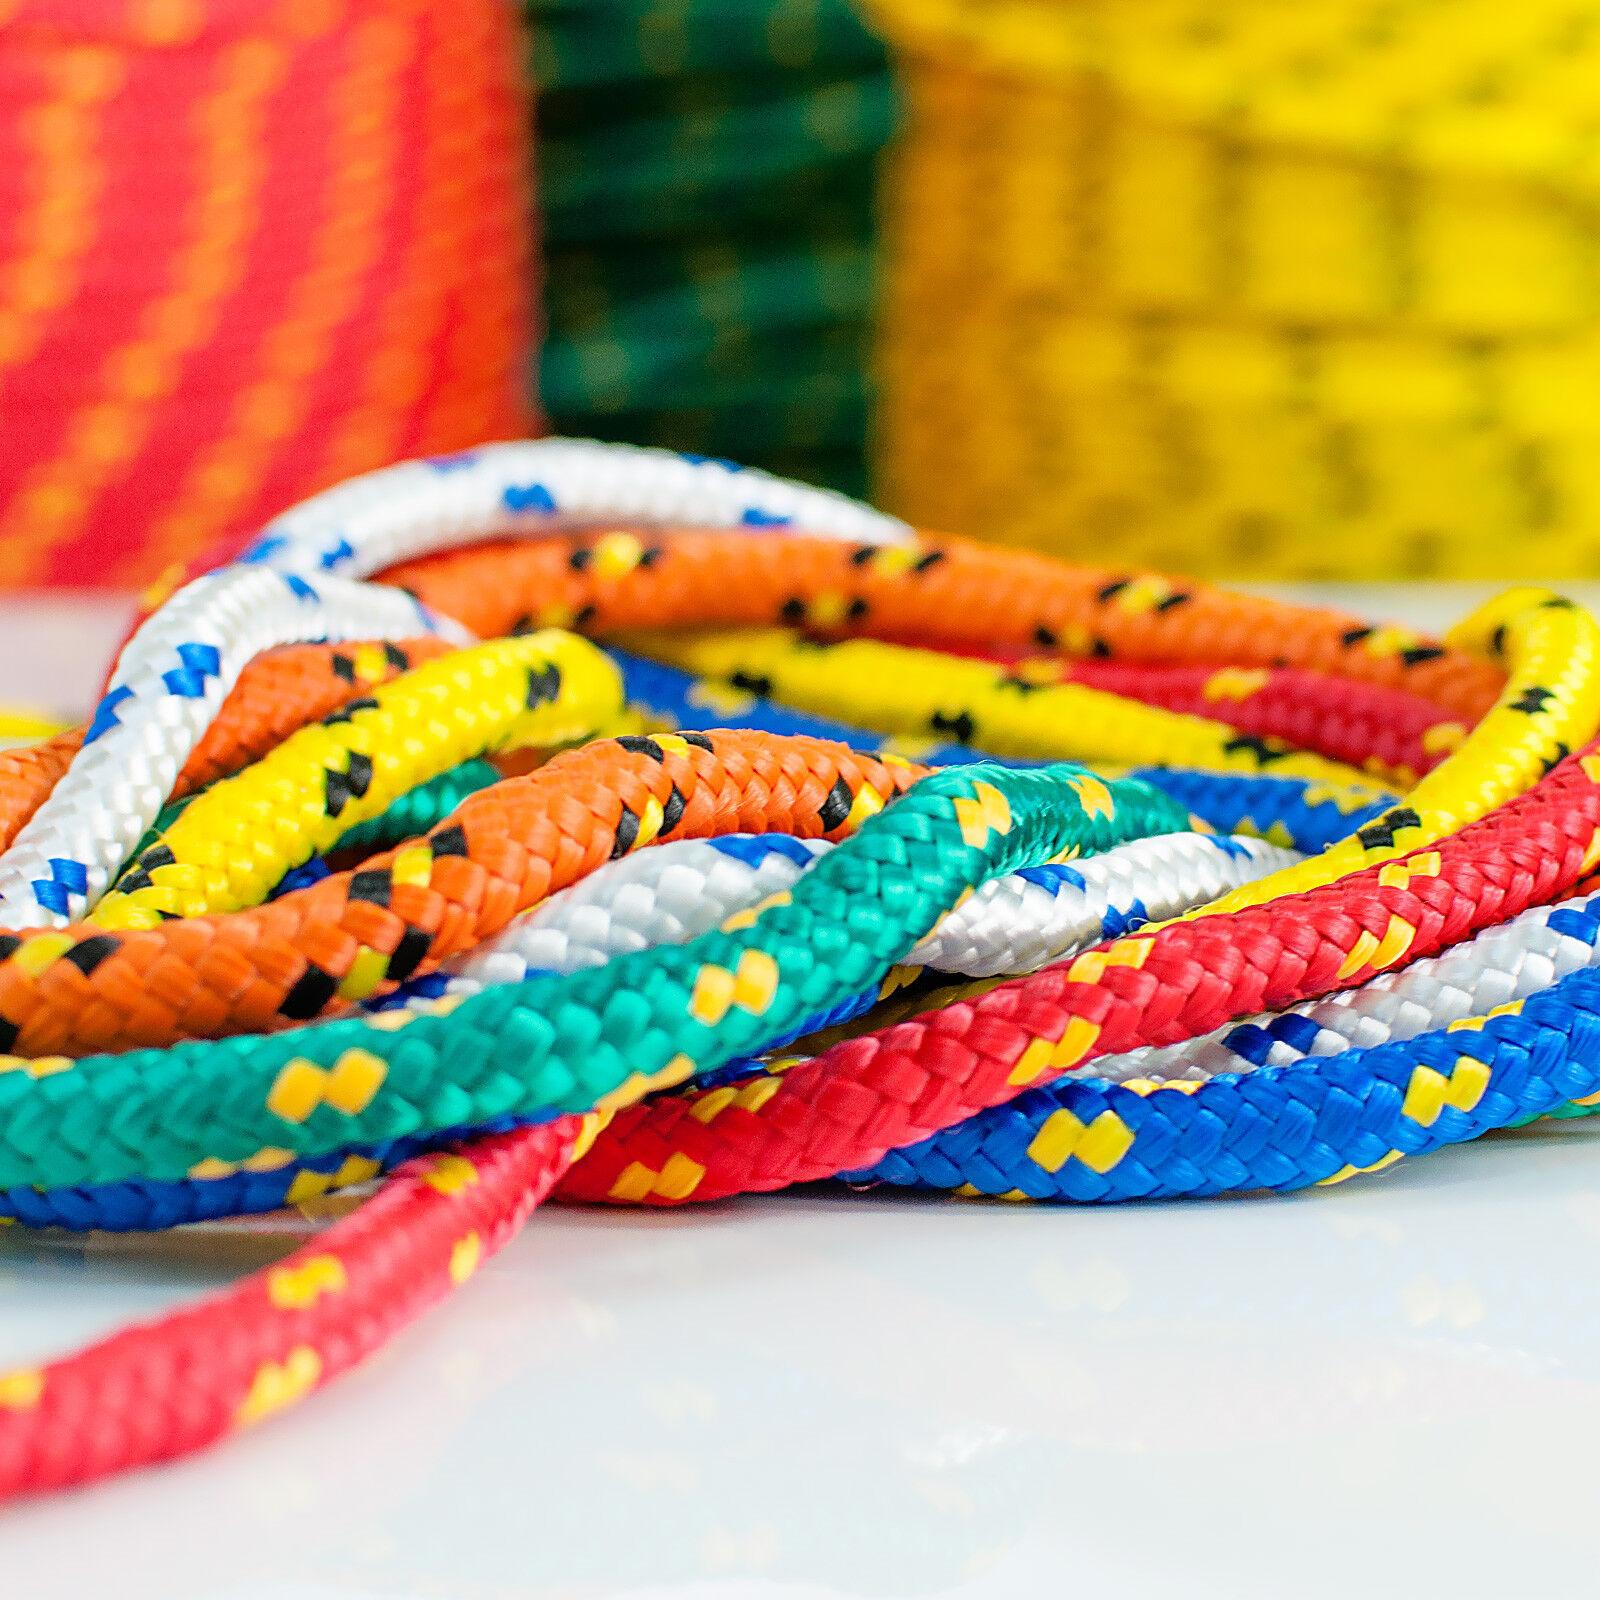 Polypropylen Seil ab 1 Meter Flechtleine Tauwerk Tau Polypropylenseil PP Seile